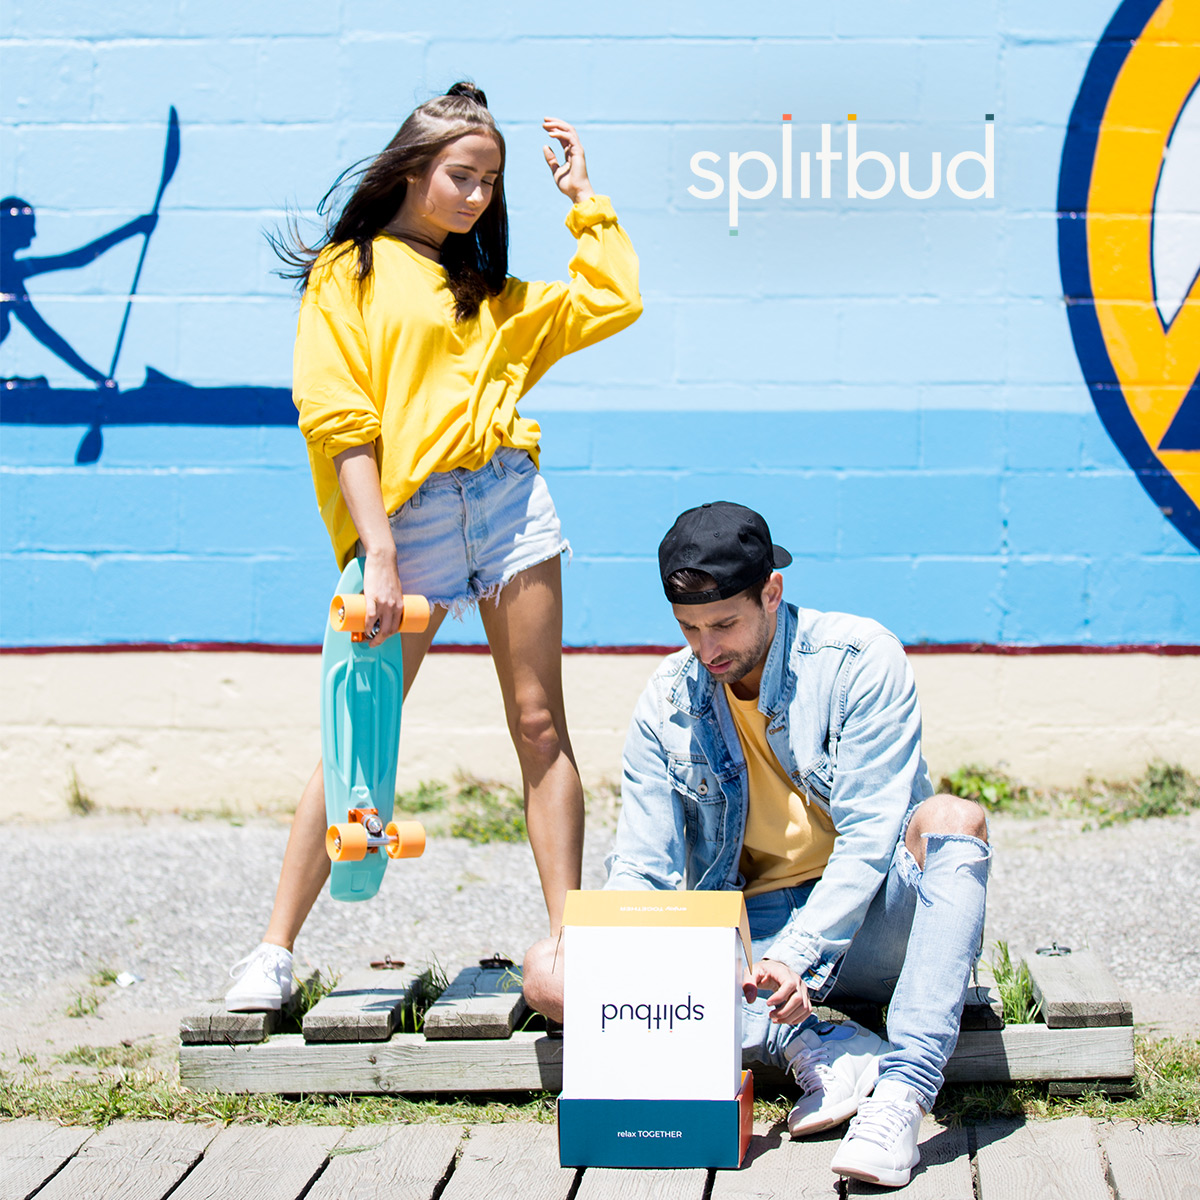 splitbud cannabis delivery